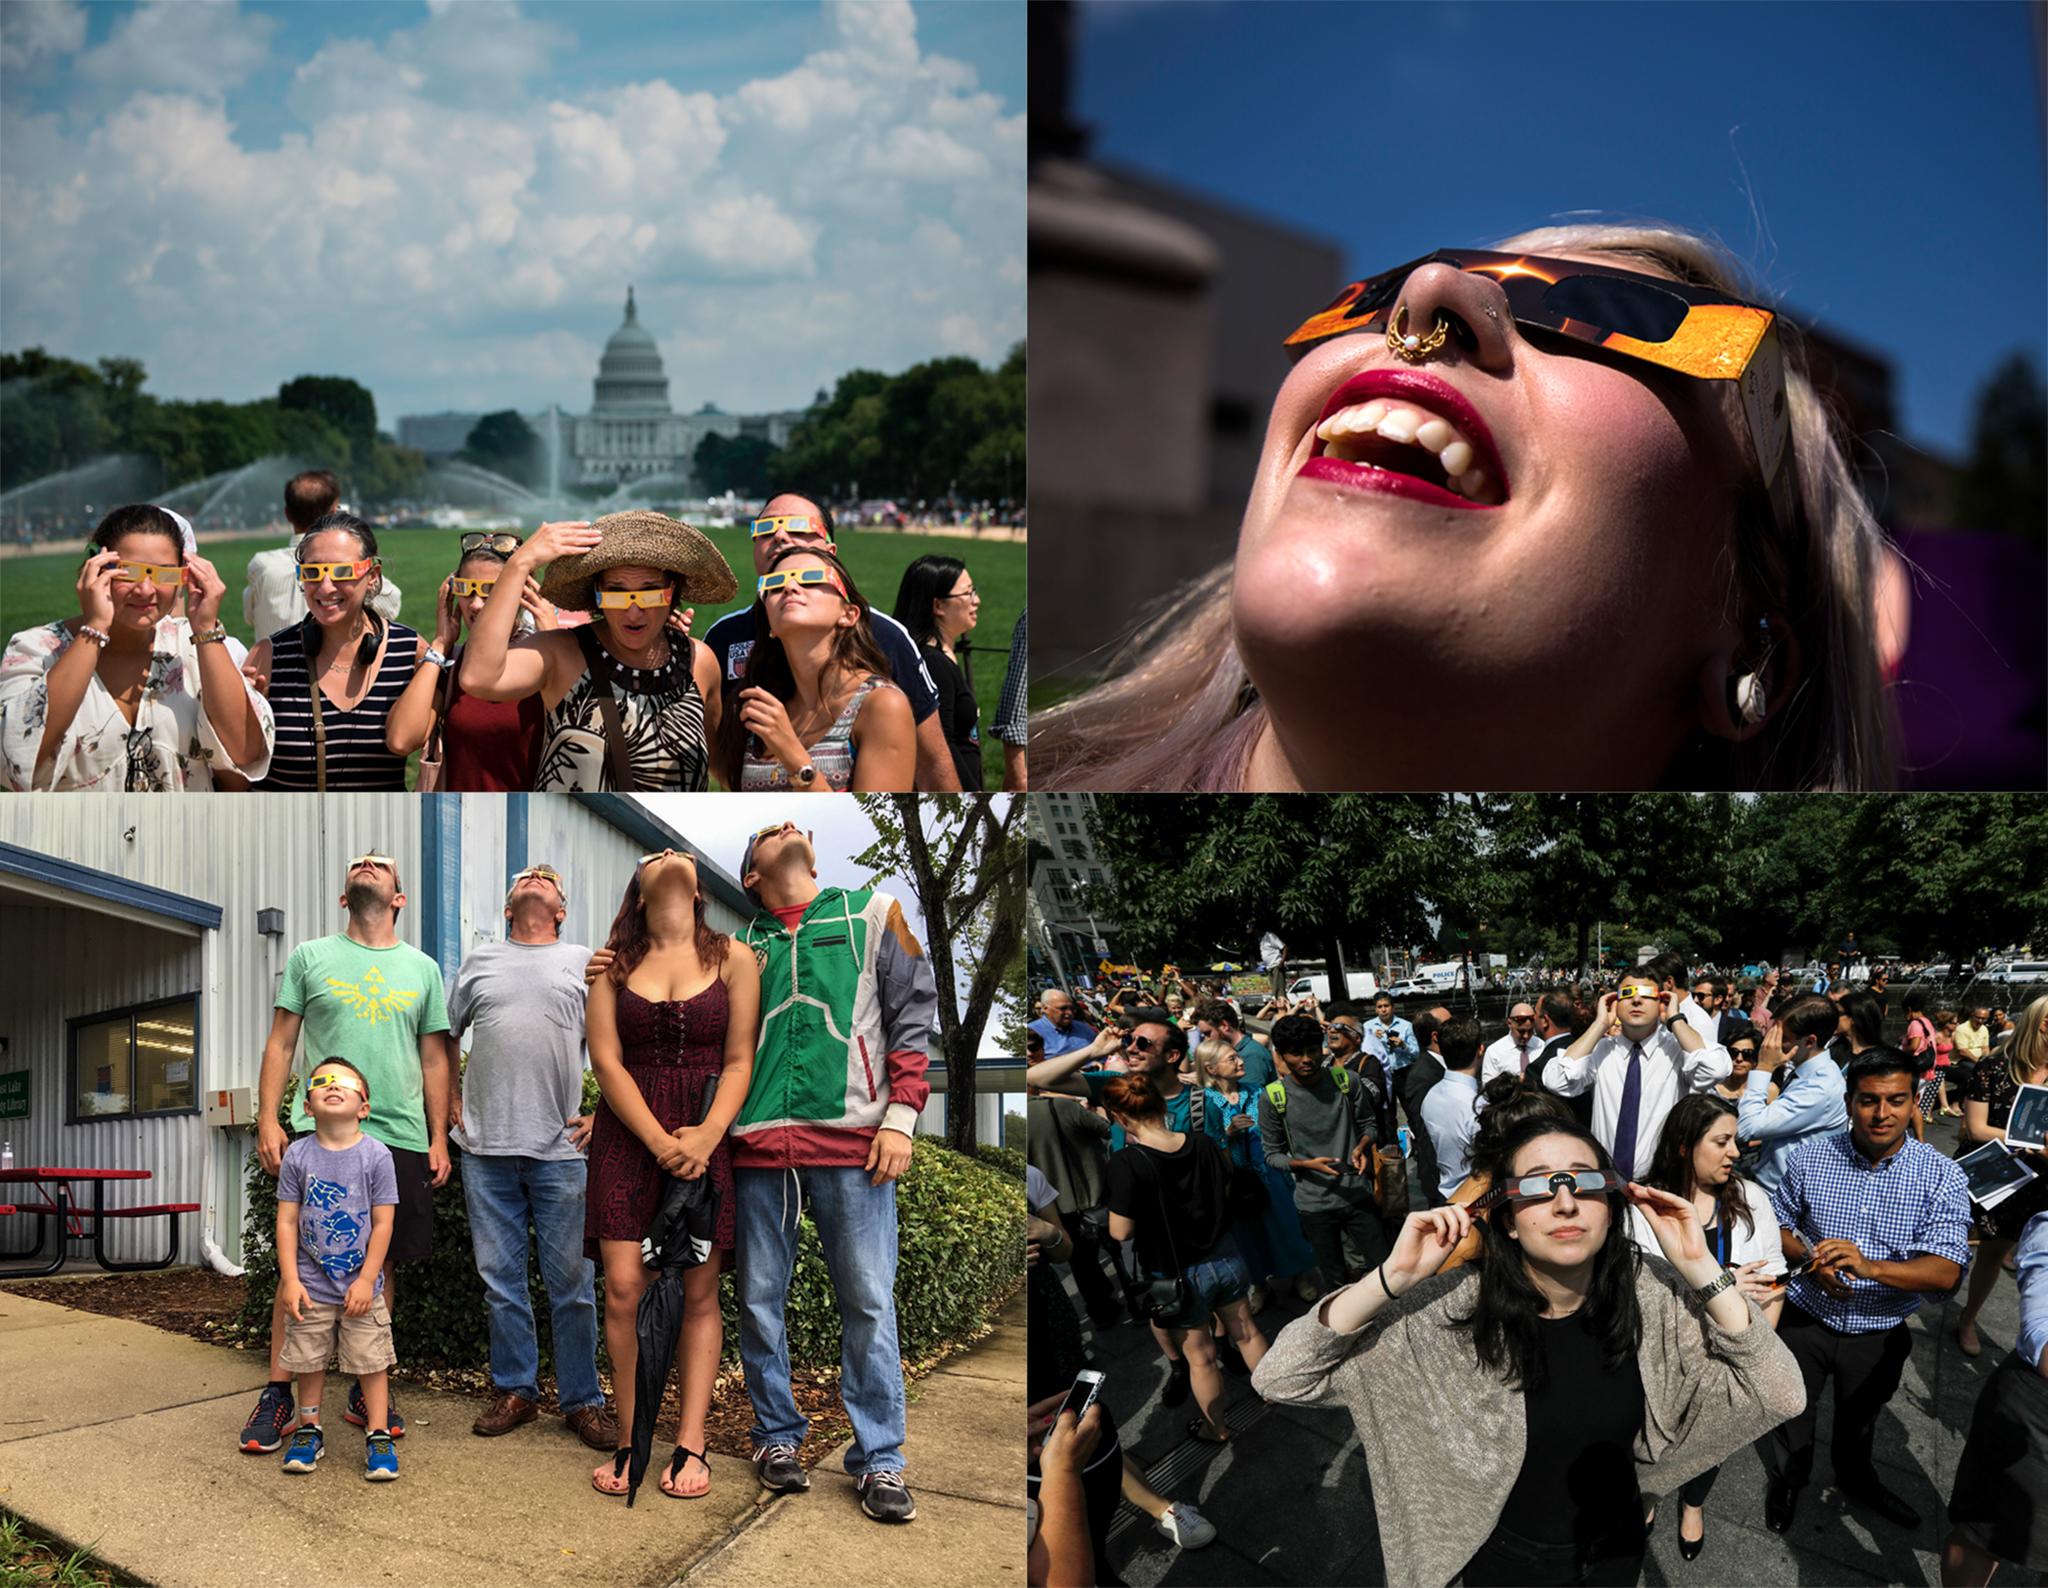 Four photos of people looking up while wearing special eyeglasses (© Brendan Smialowski/Getty; © Derek Davis/Portland Press Herald/Getty; © Peter Foley/Bloomberg/Getty; © Stephen Hudak/Orlando Sentinel/TNS/Getty)